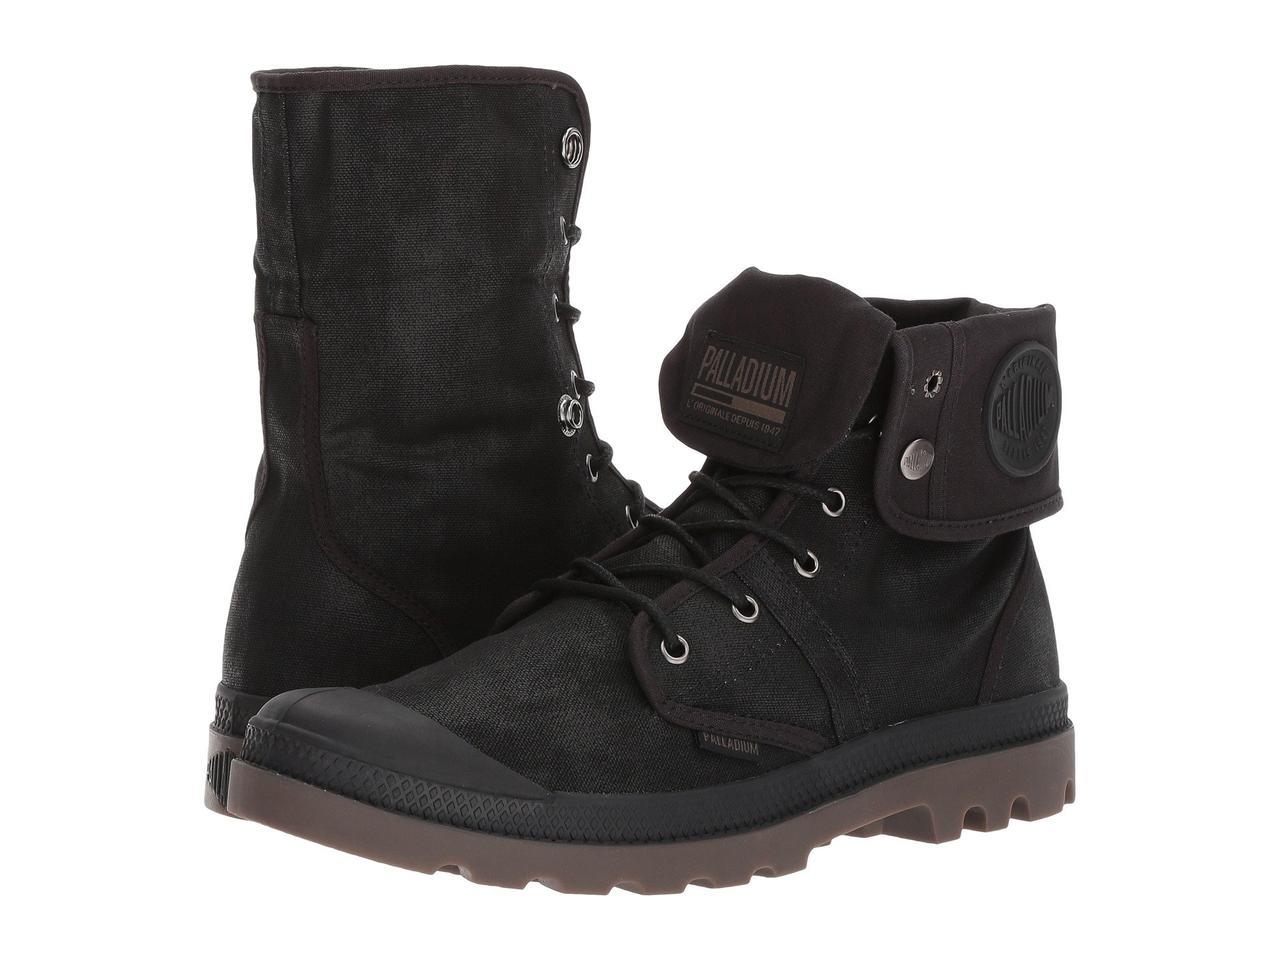 Ботинки Сапоги (Оригинал) Palladium Pallabrouse BGY Wax Black Dark ... 4c48d7d1de3a0